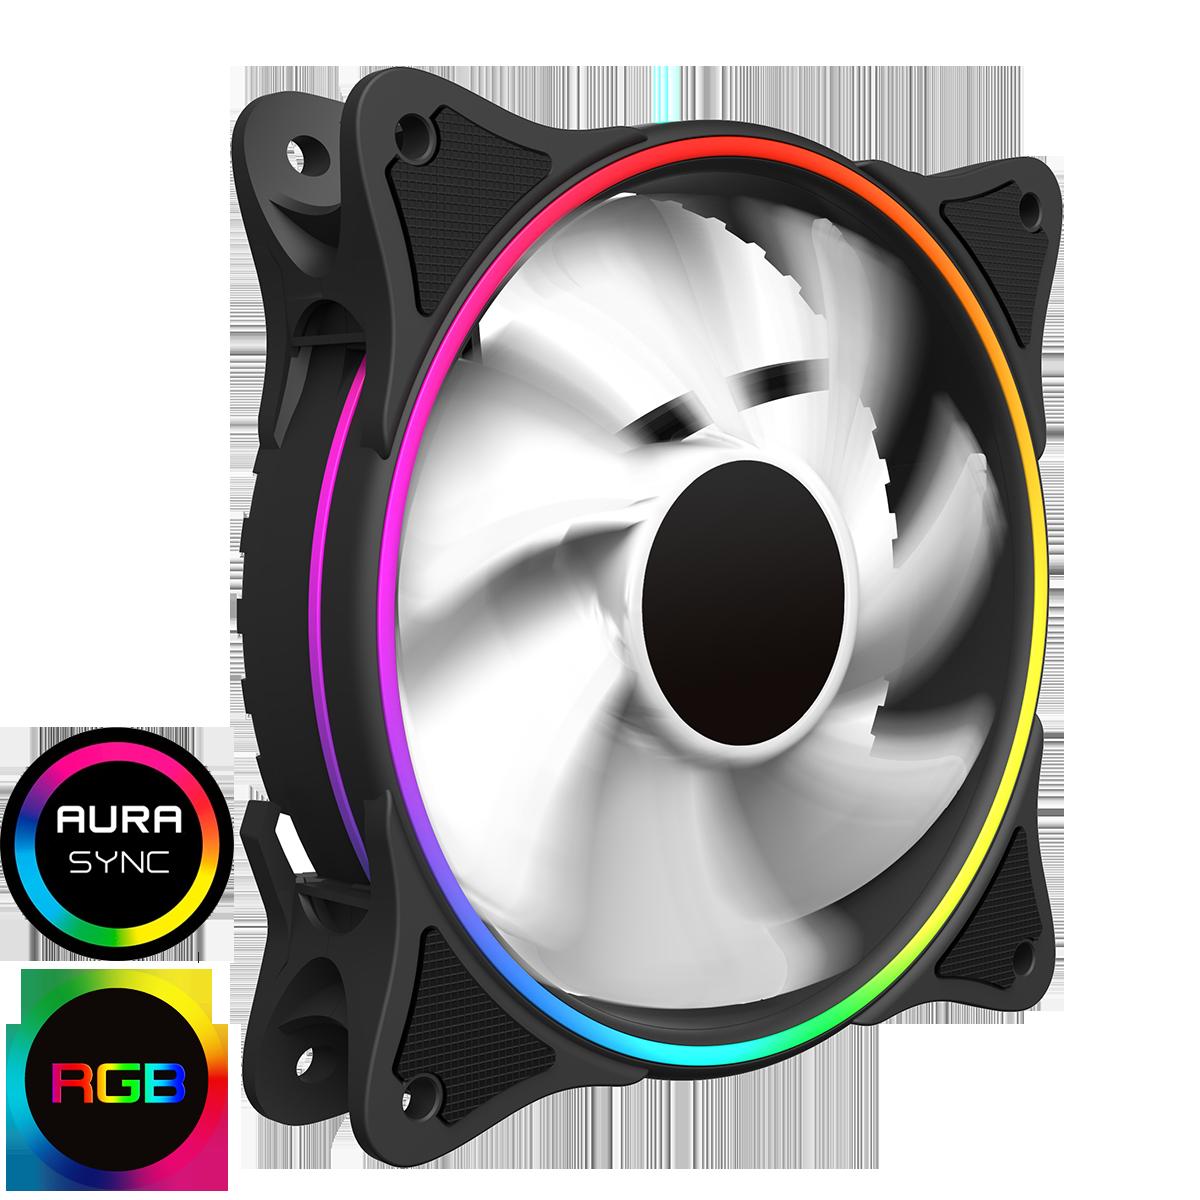 Mirage White Fins Rainbow RGB 5V Addressable 3pin Header & 3pin M/B